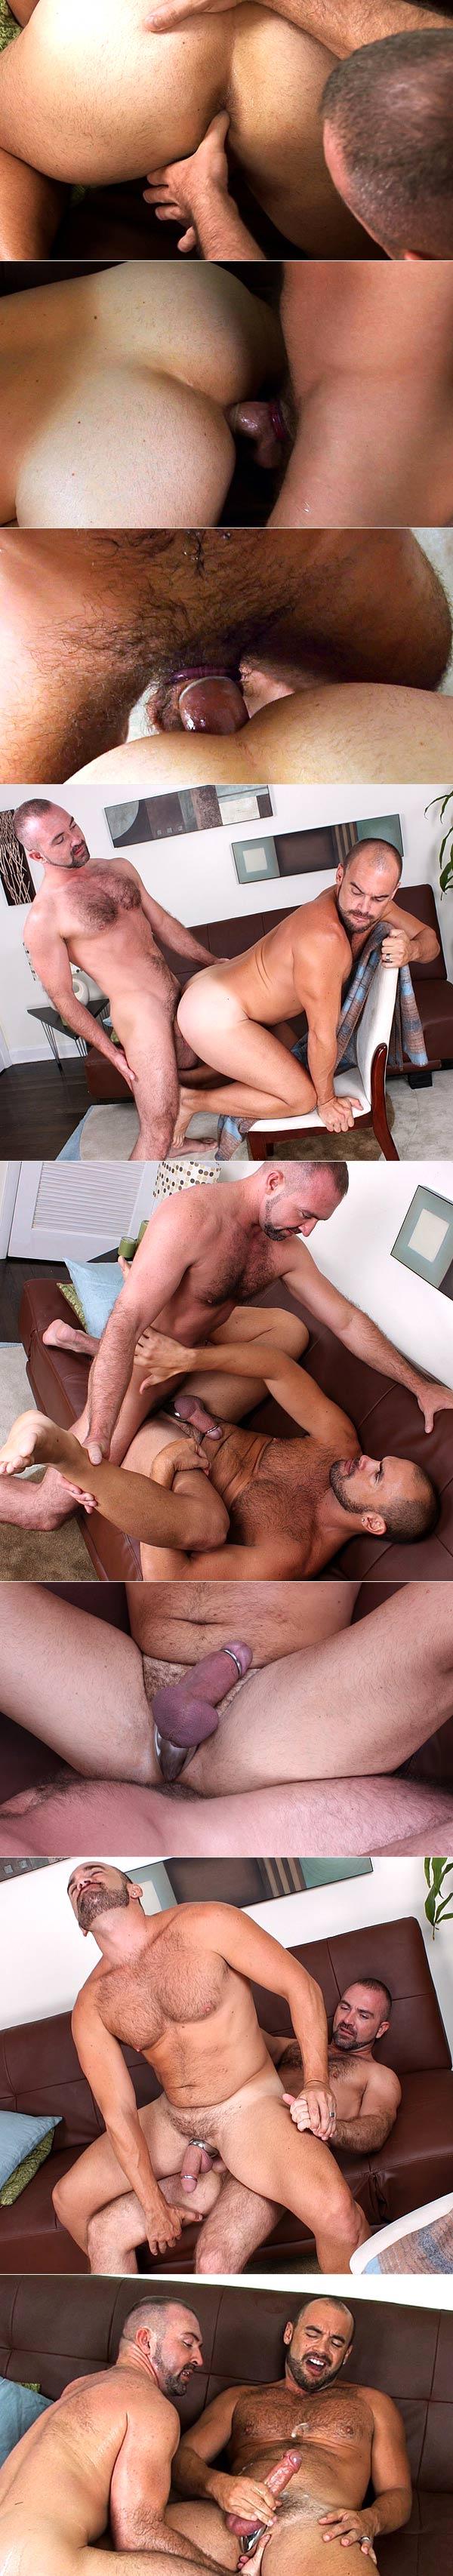 Josh West & Jessie Balboa (West Ida-Hoe) at ExtraBigDicks.com